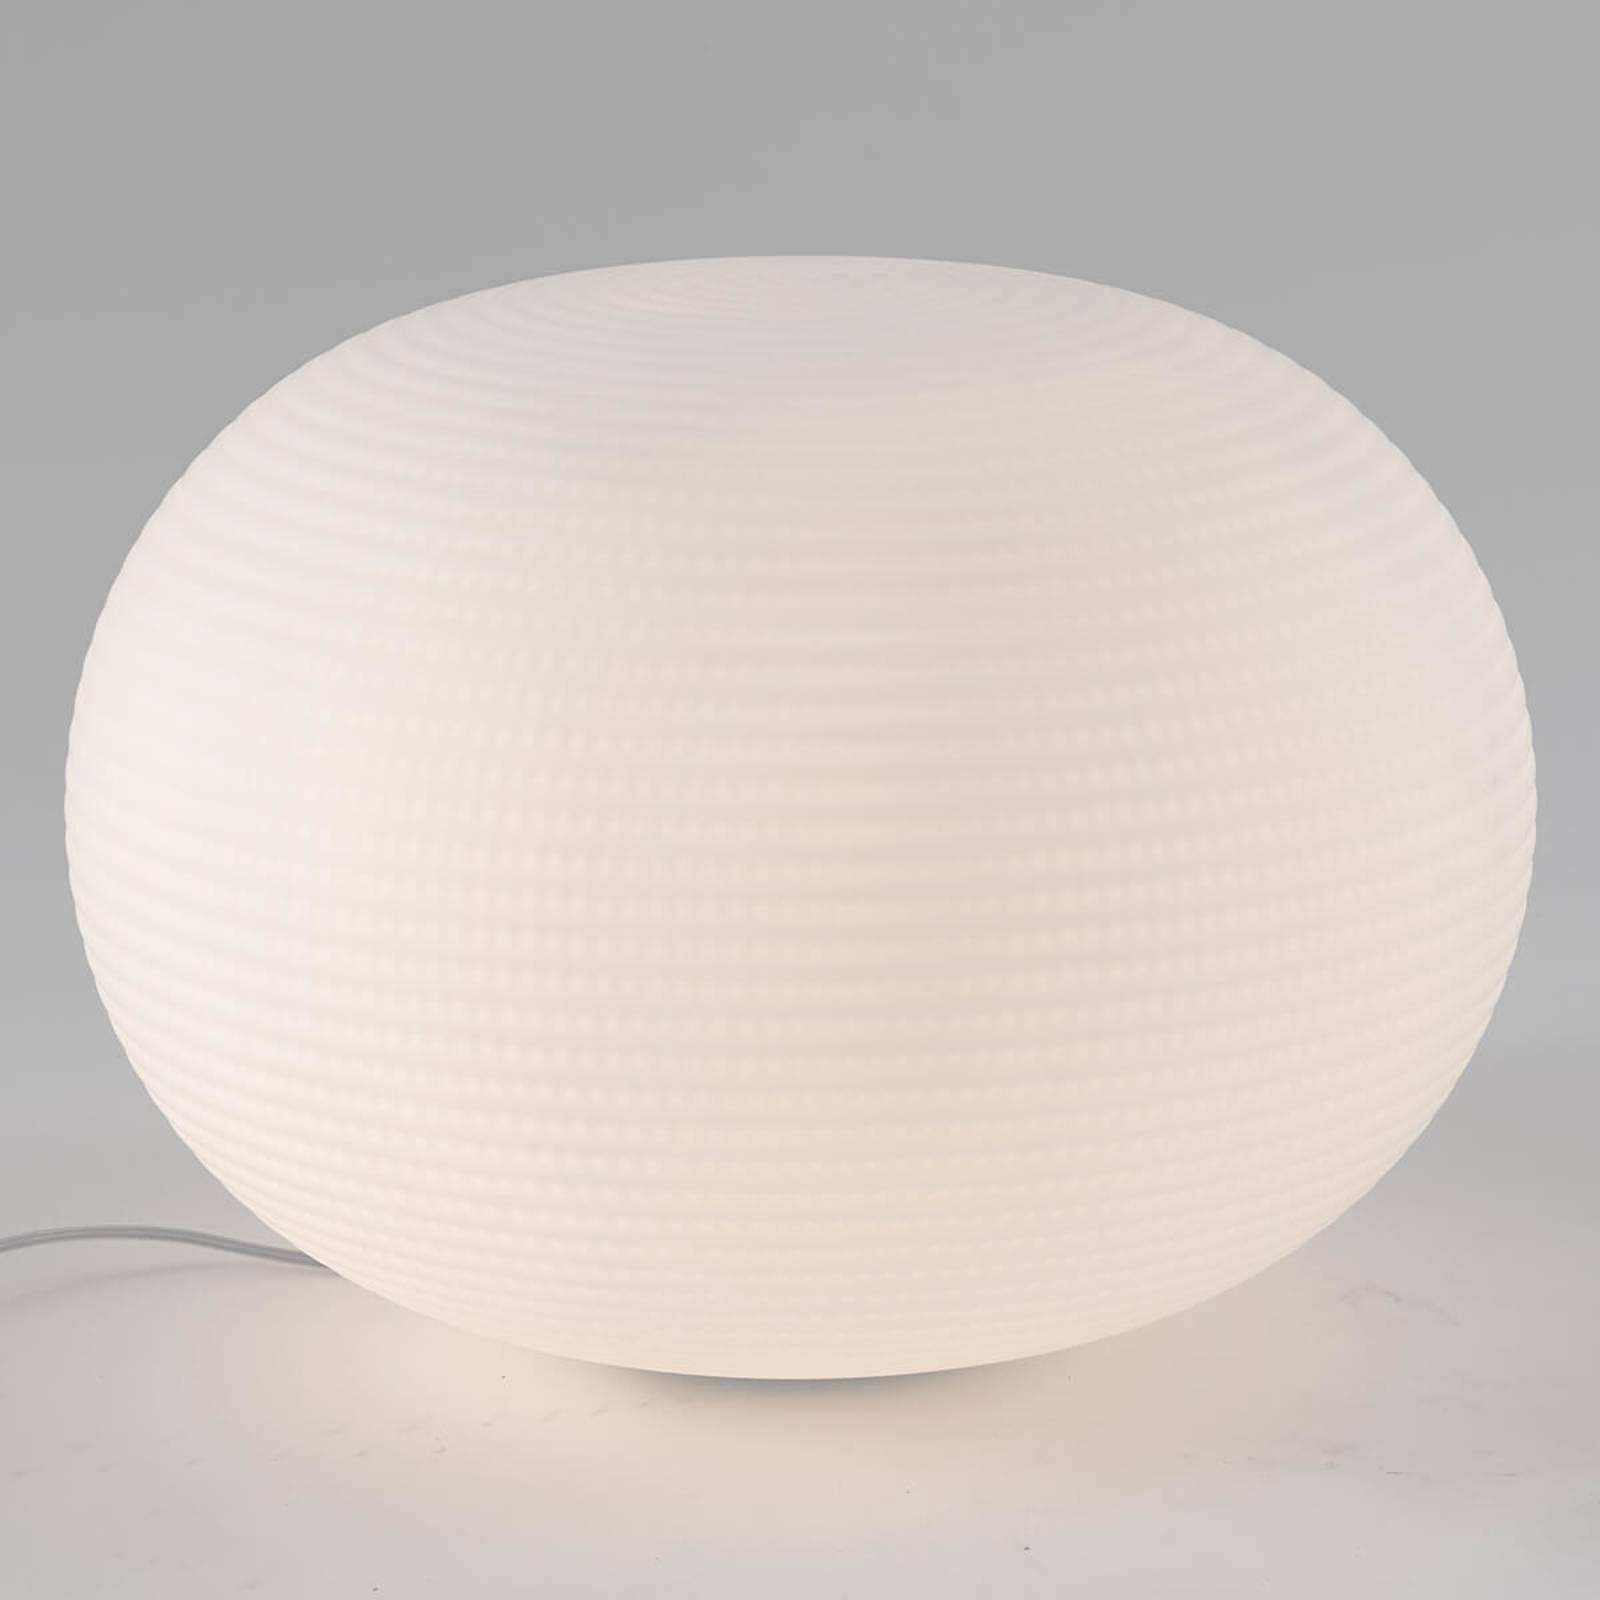 Lampe à poser de designer Bianca en verre, 50 cm